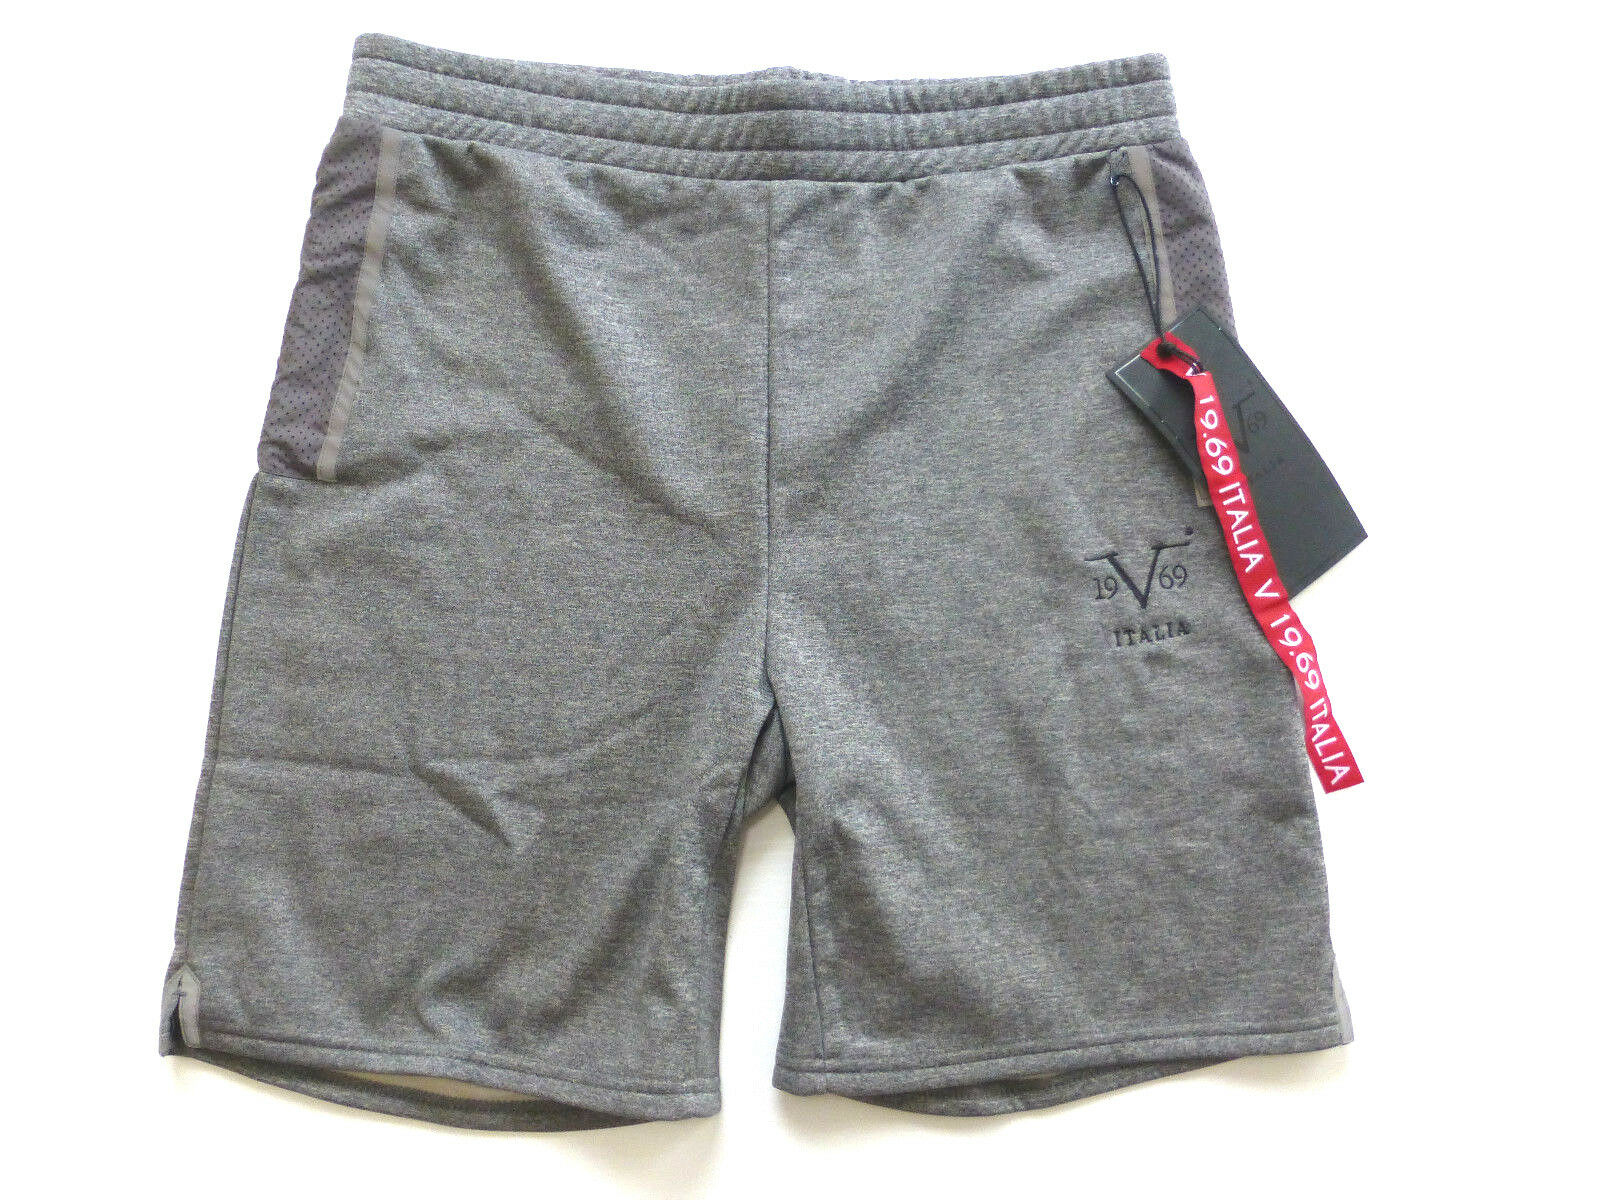 Versace V 19.69 Italia Mens M Performance Fleece Mesh Panel Knit Shorts New